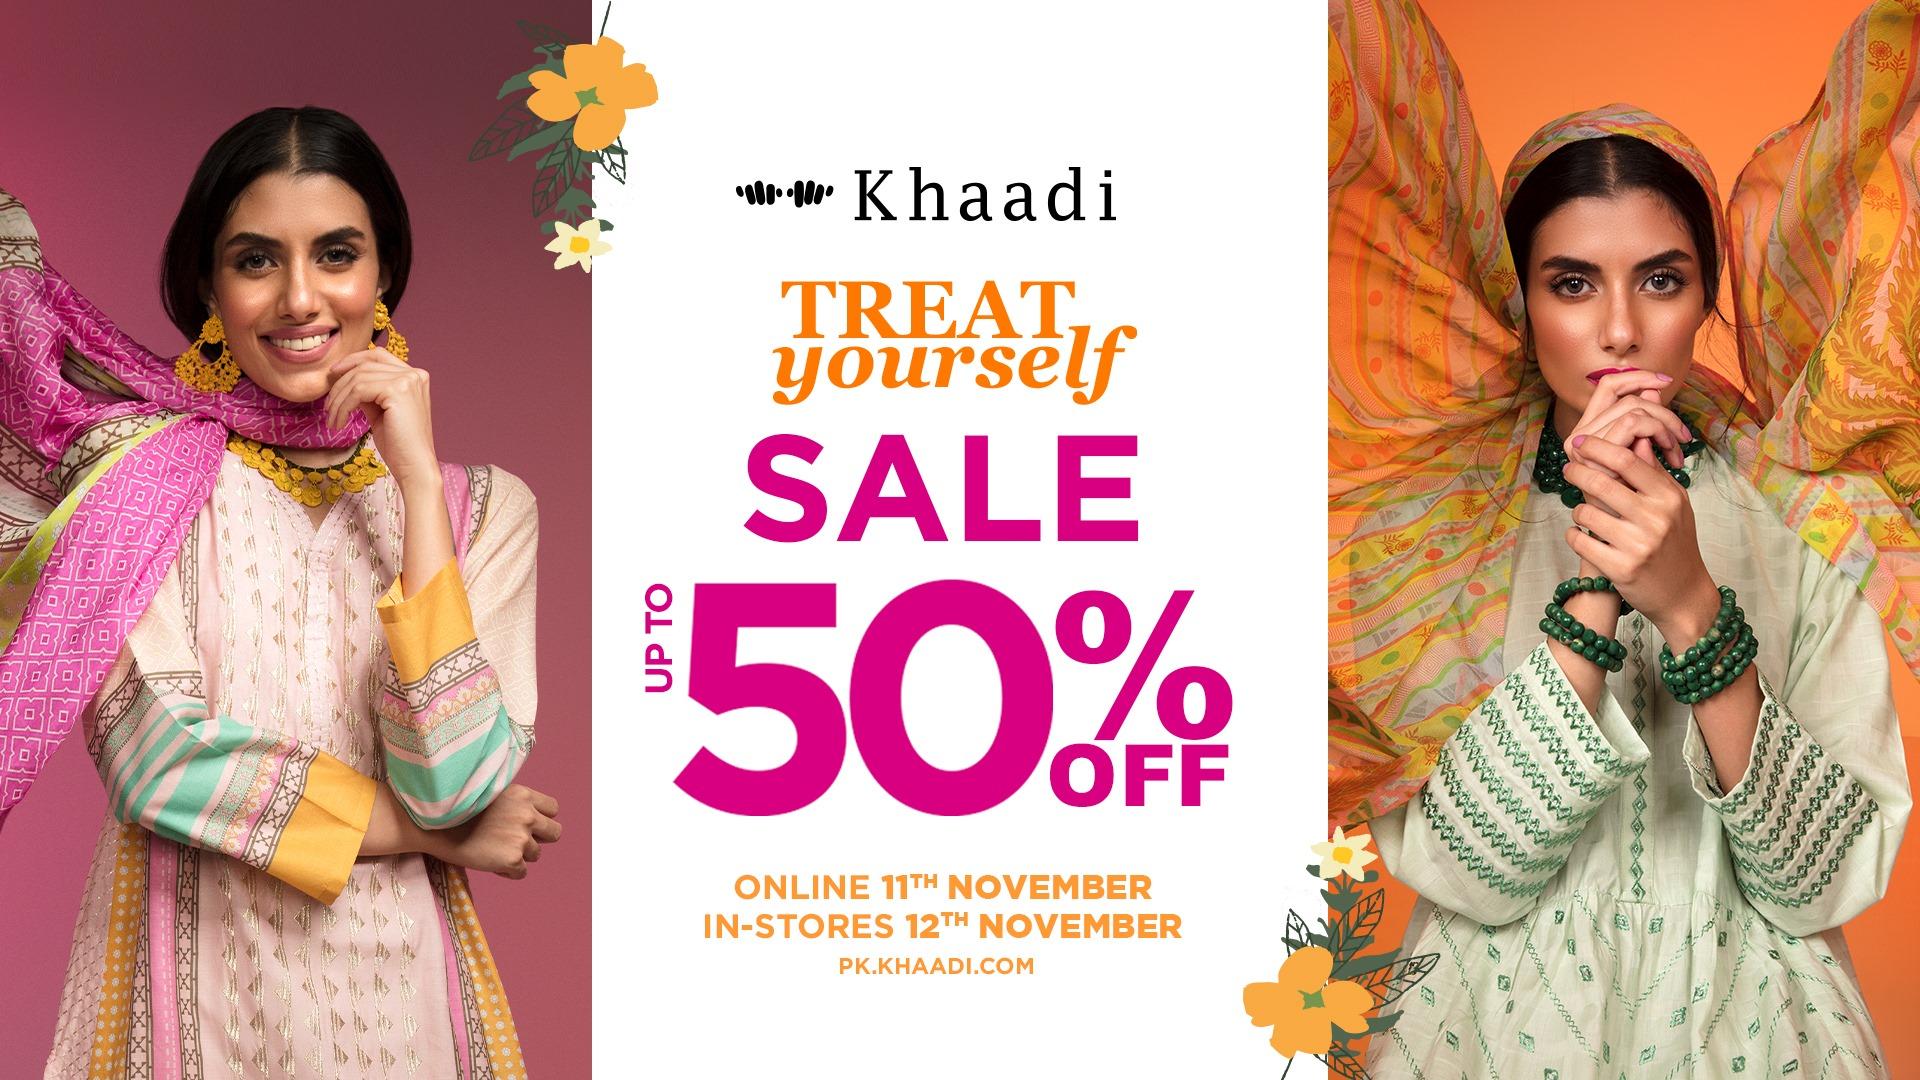 Khaadi - Treat Yourself Sale